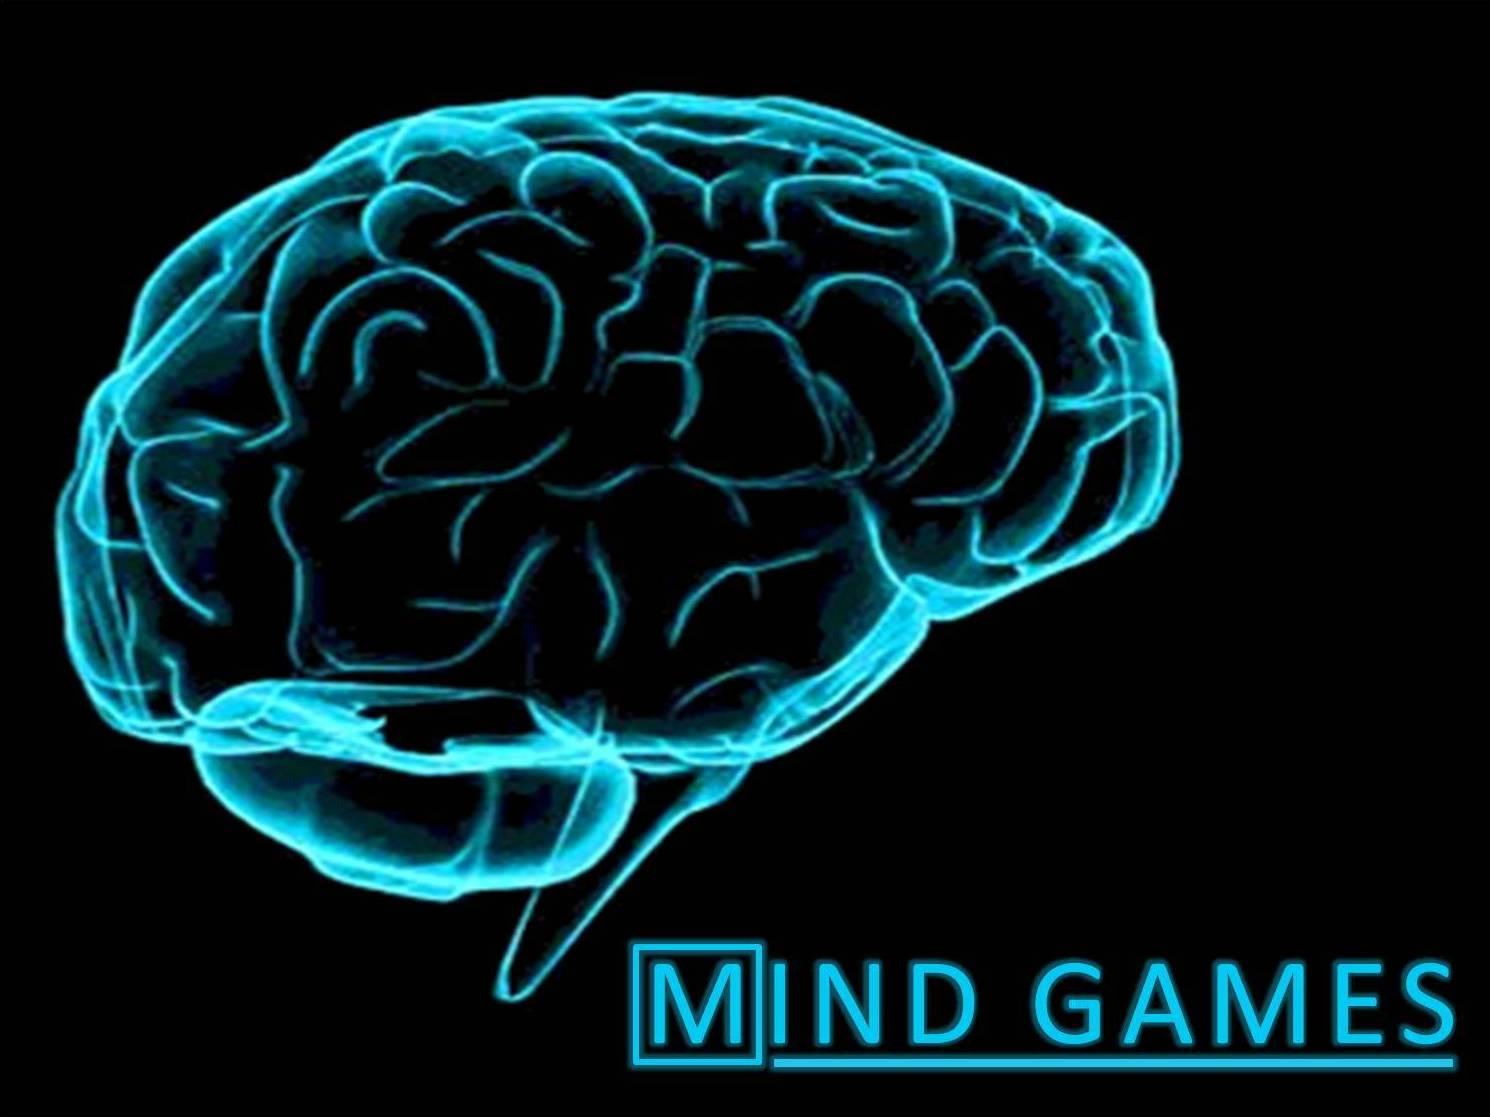 Speel die Mind Games maar zonder mij